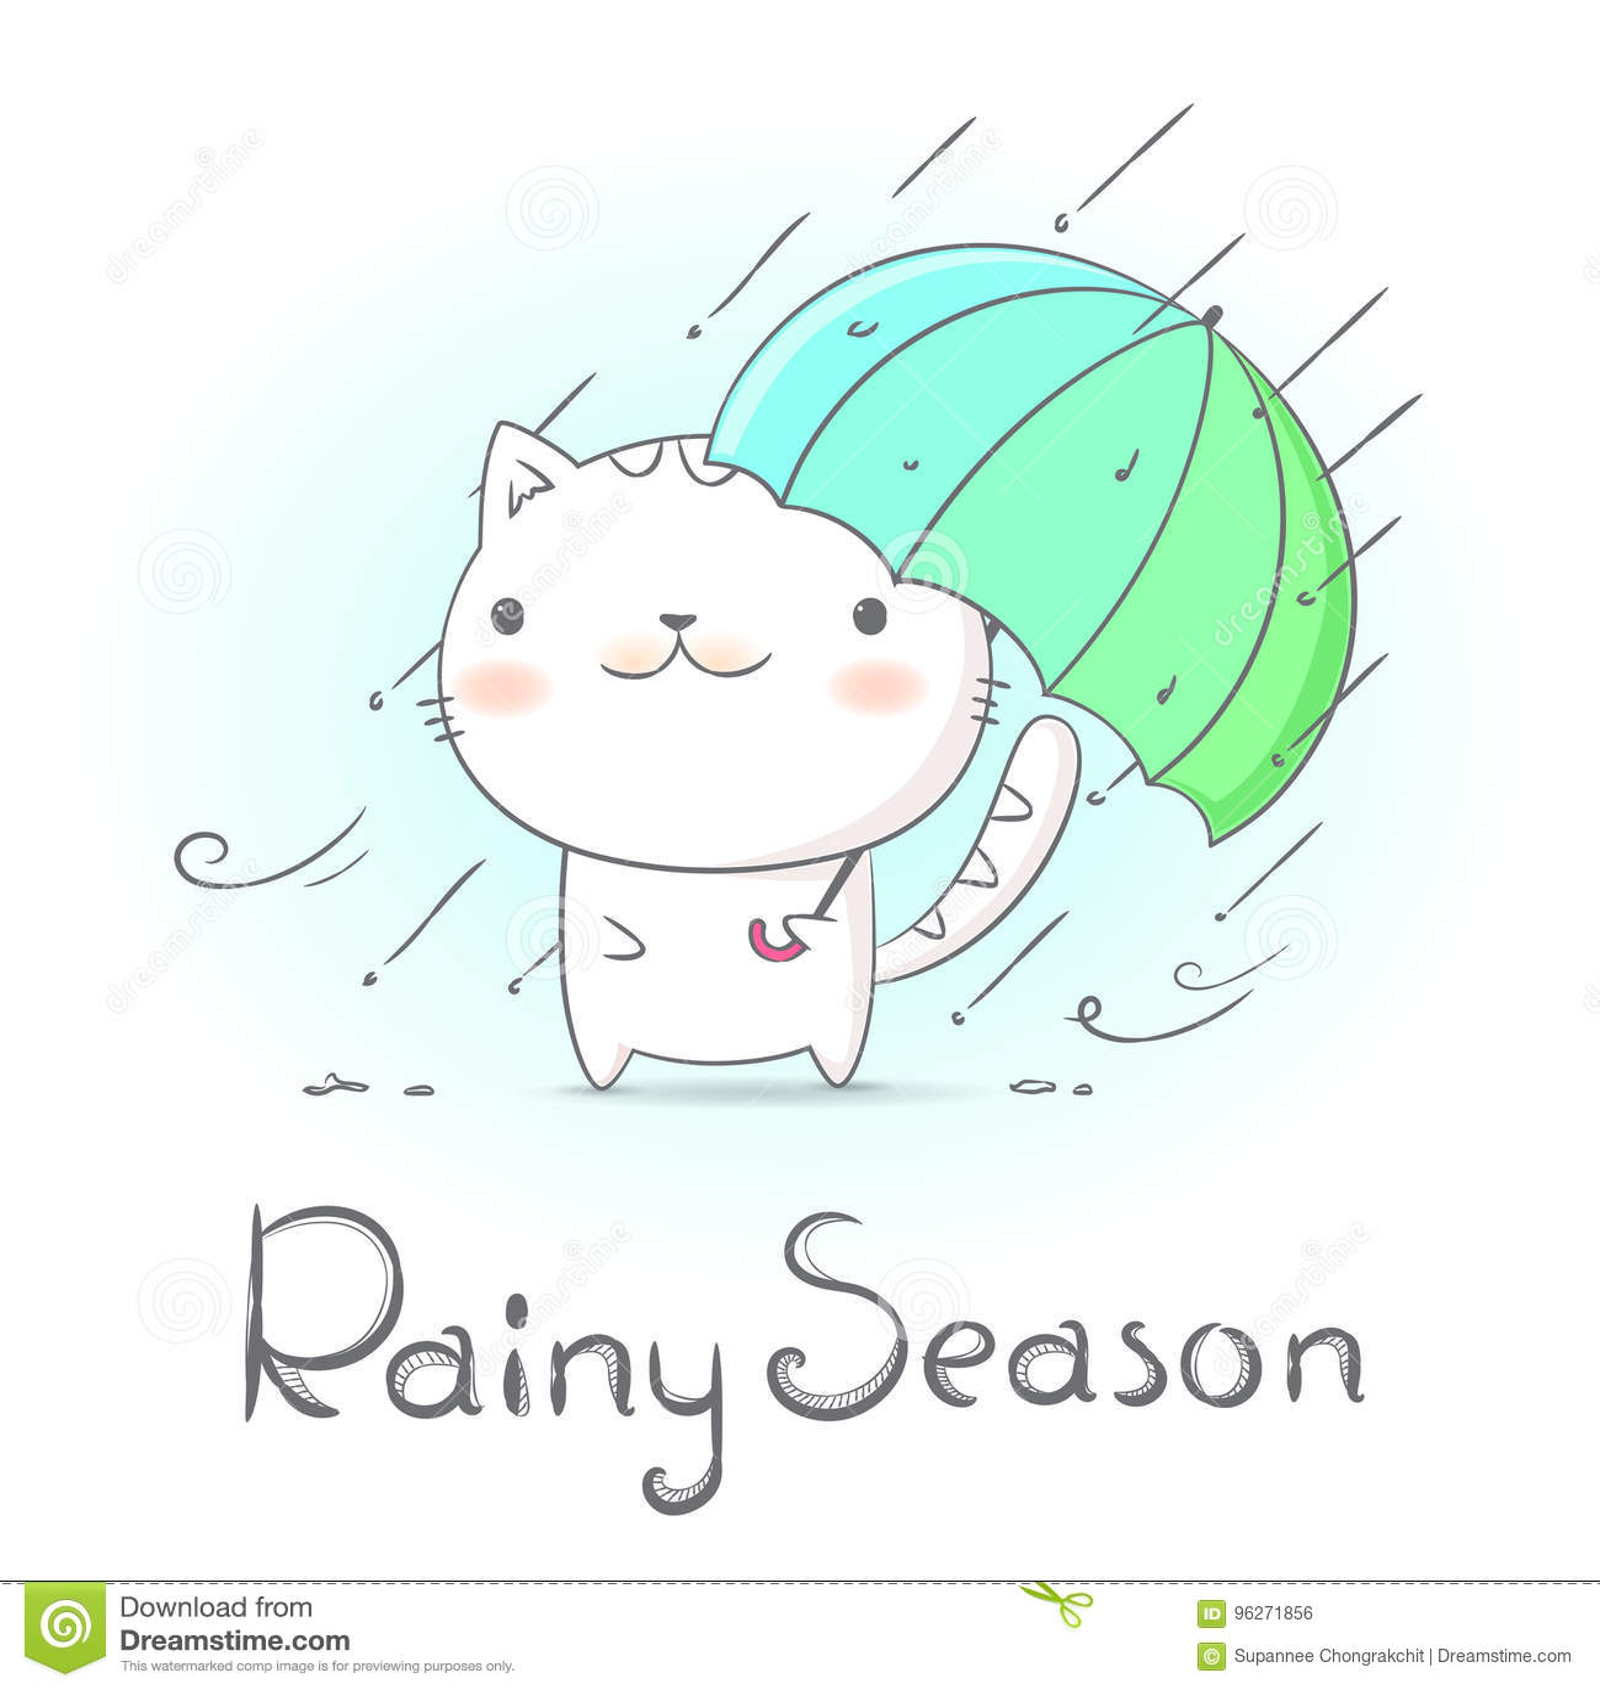 Cat Under Umbrella And Raining In Rainy Season Hand Draw Doodle